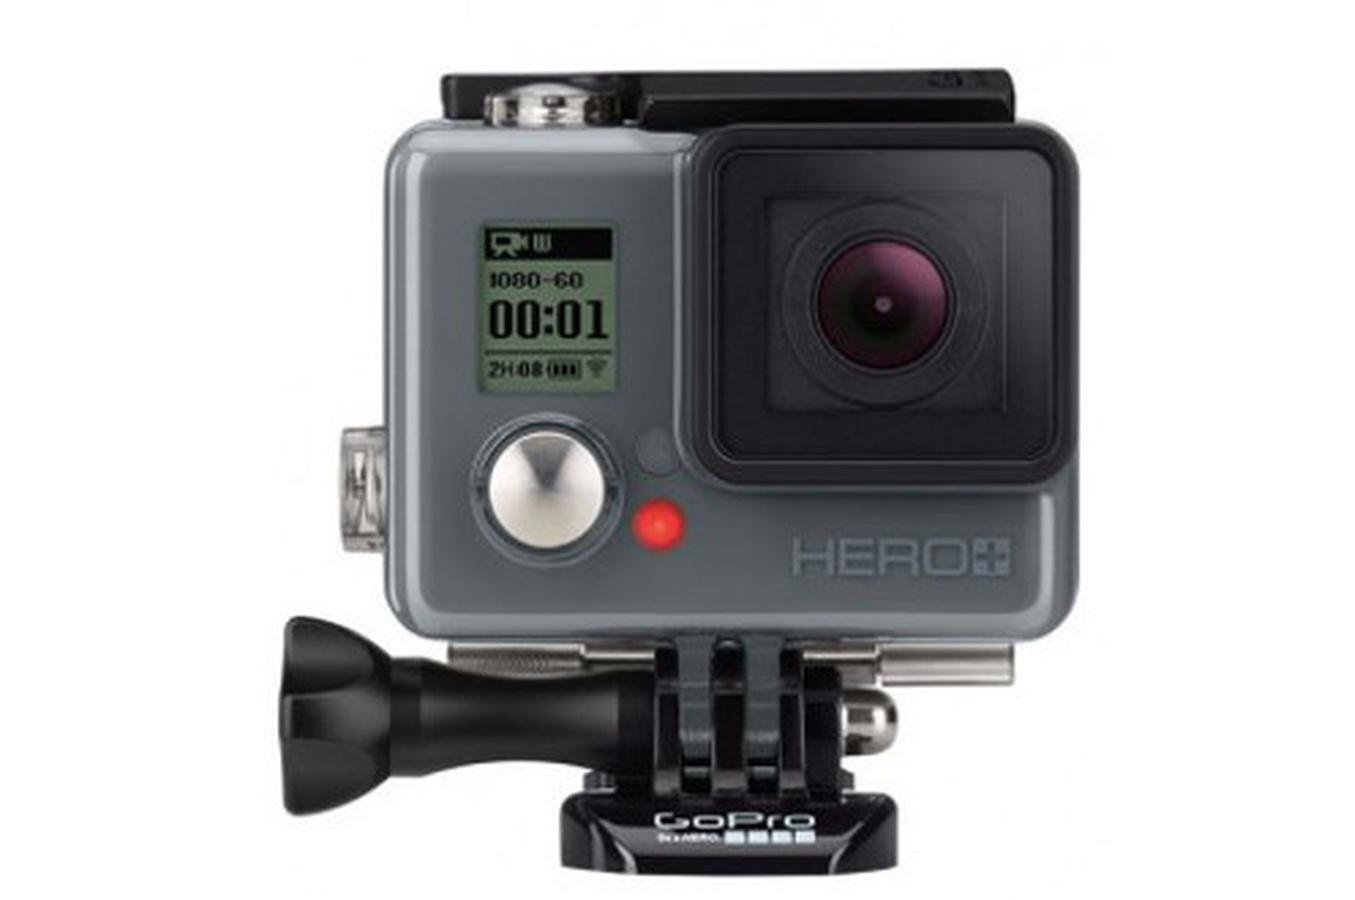 Caméra sportive GoPro Hero+ - Full HD, 1080p, Wi-Fi